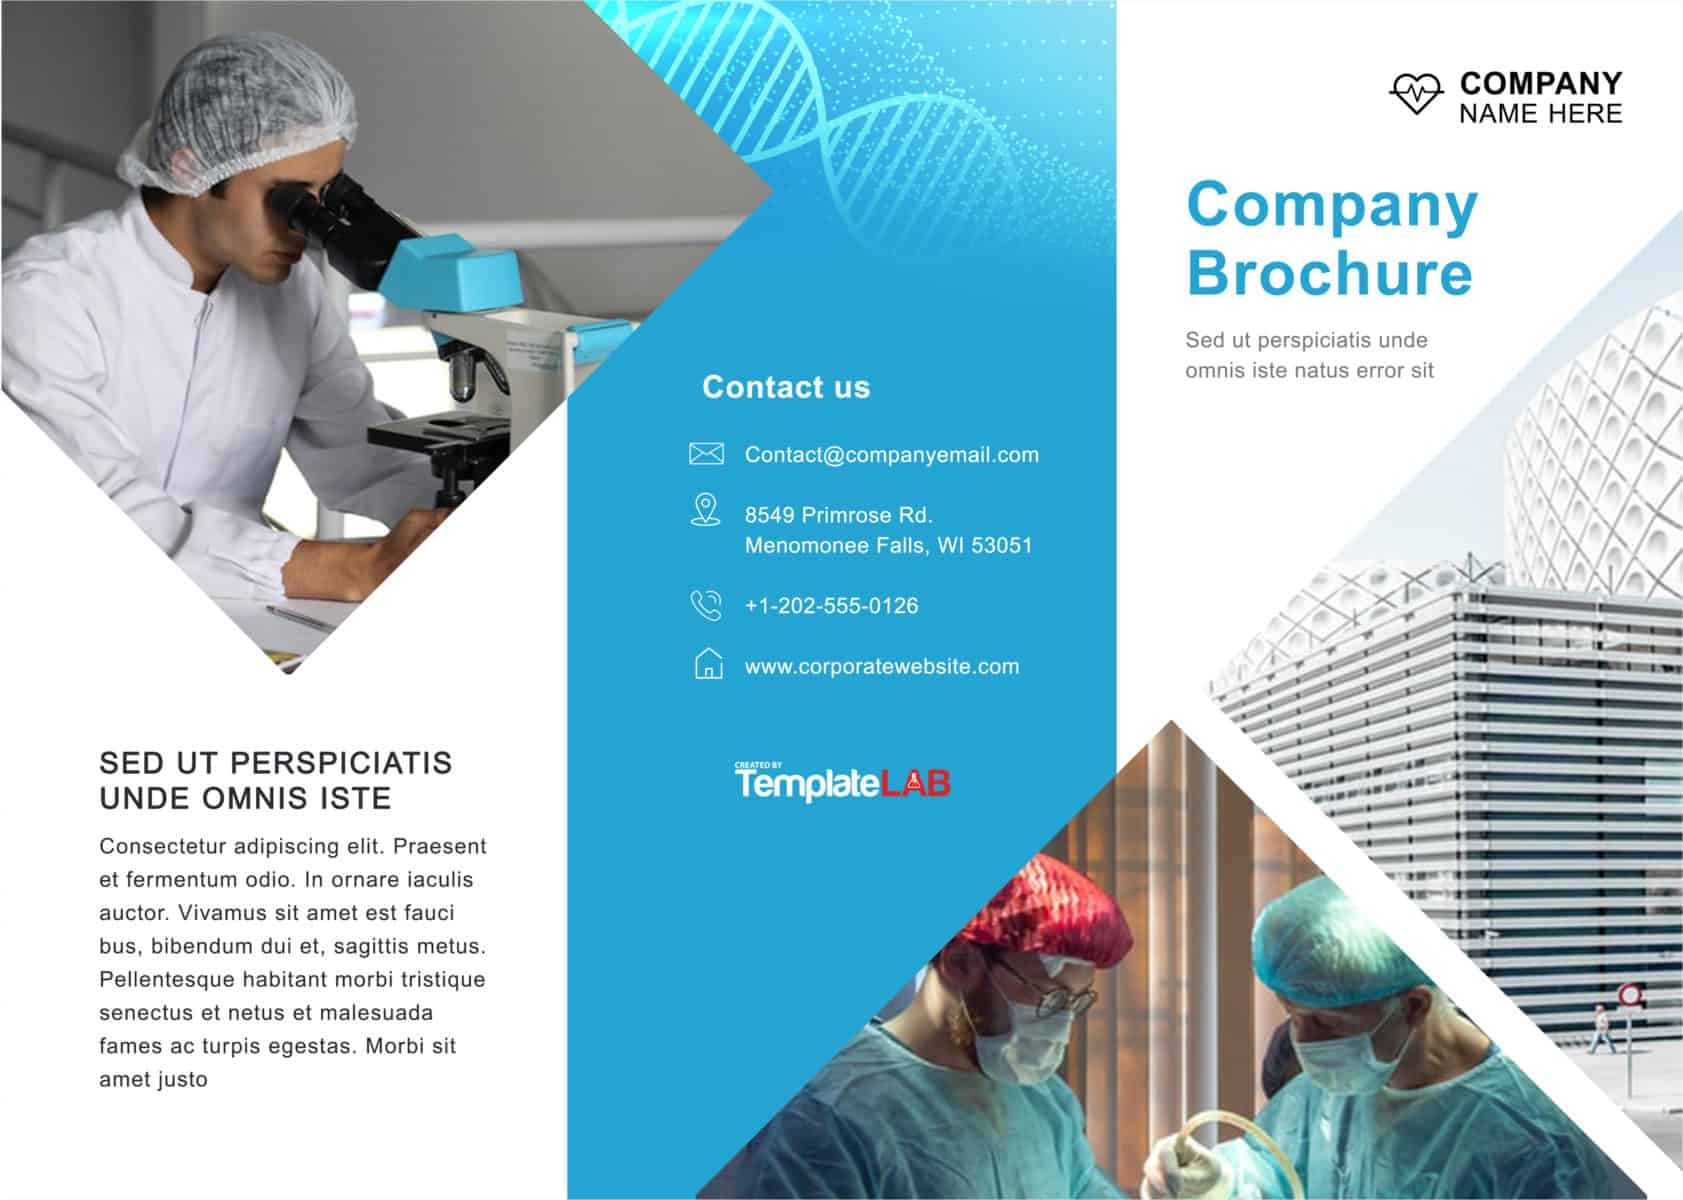 33 Free Brochure Templates (Word + Pdf) ᐅ Templatelab With Engineering Brochure Templates Free Download